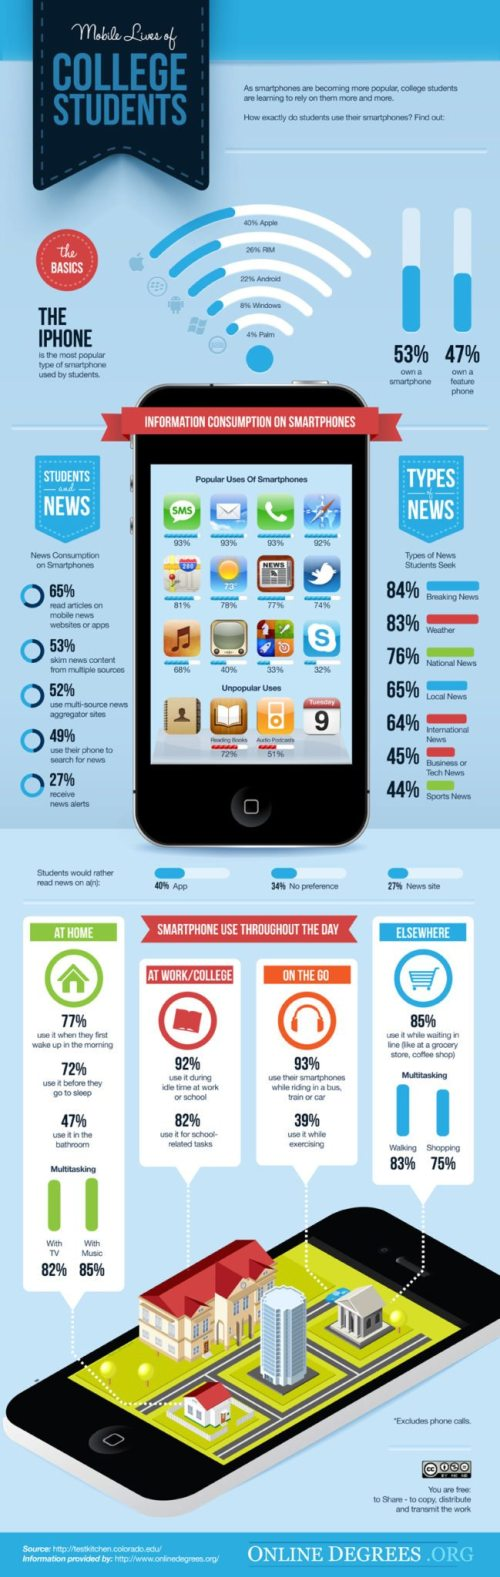 Mobile Lives of Online Colleges